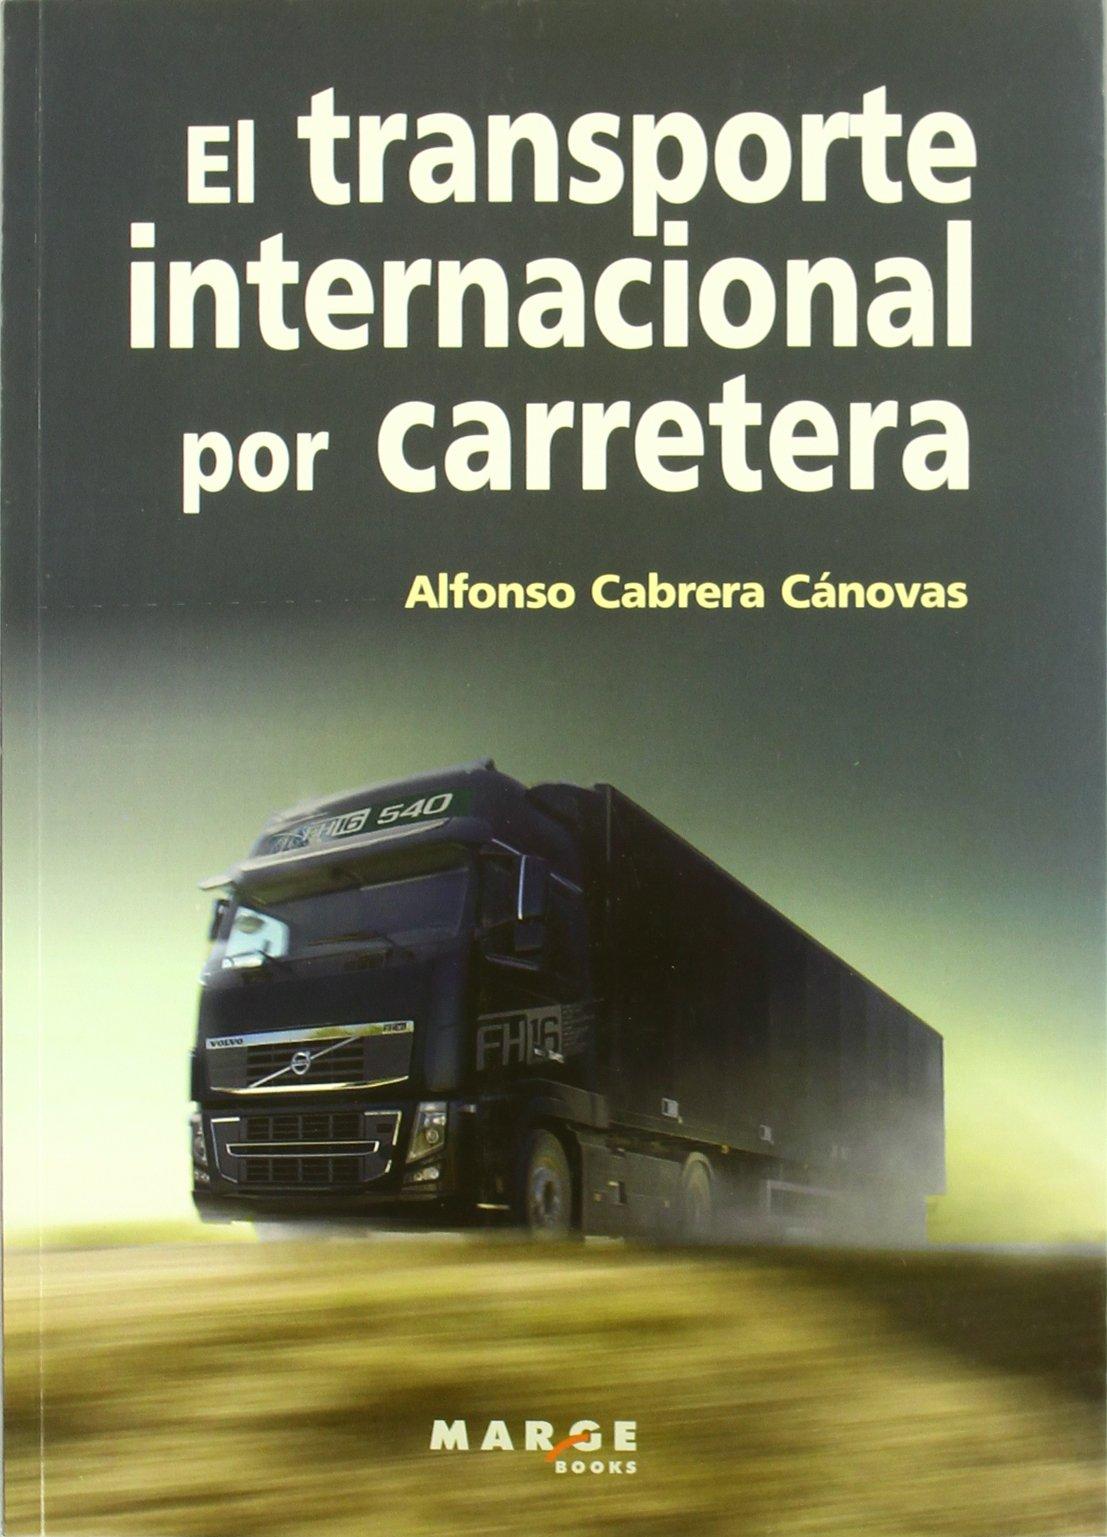 El transporte internacional por carretera (Biblioteca de Logística) Tapa blanda – 26 sep 2011 Alfonso Cabrera Cánovas Marge Books 8415340060 Highways